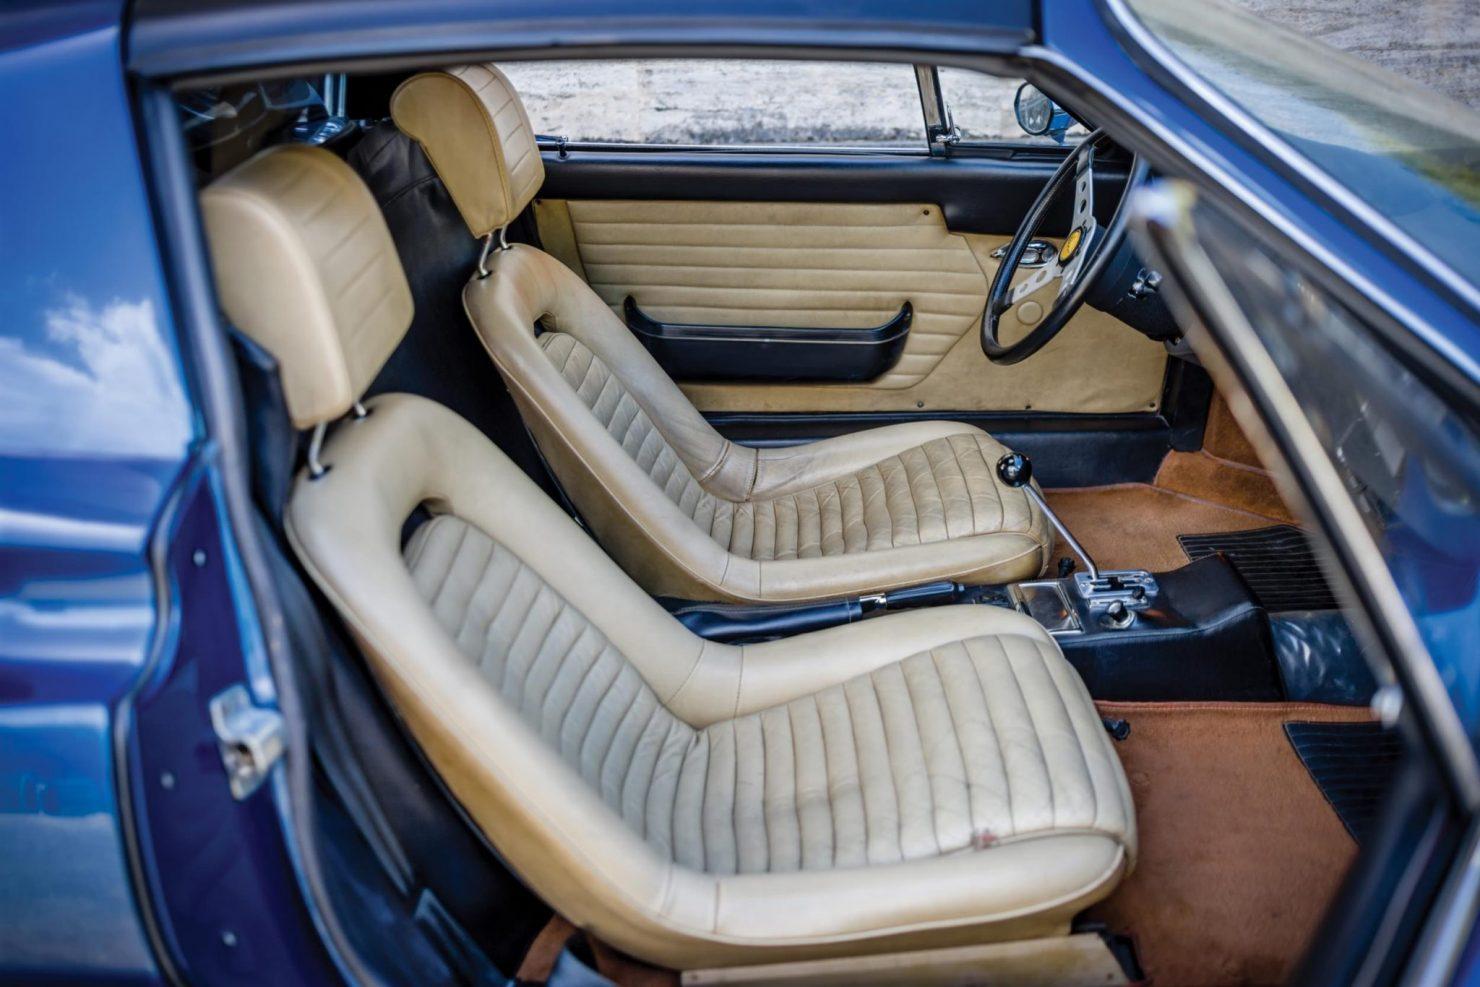 ferrari dino 246 gts car 4 1480x987 - 1973 Ferrari Dino 246 GTS